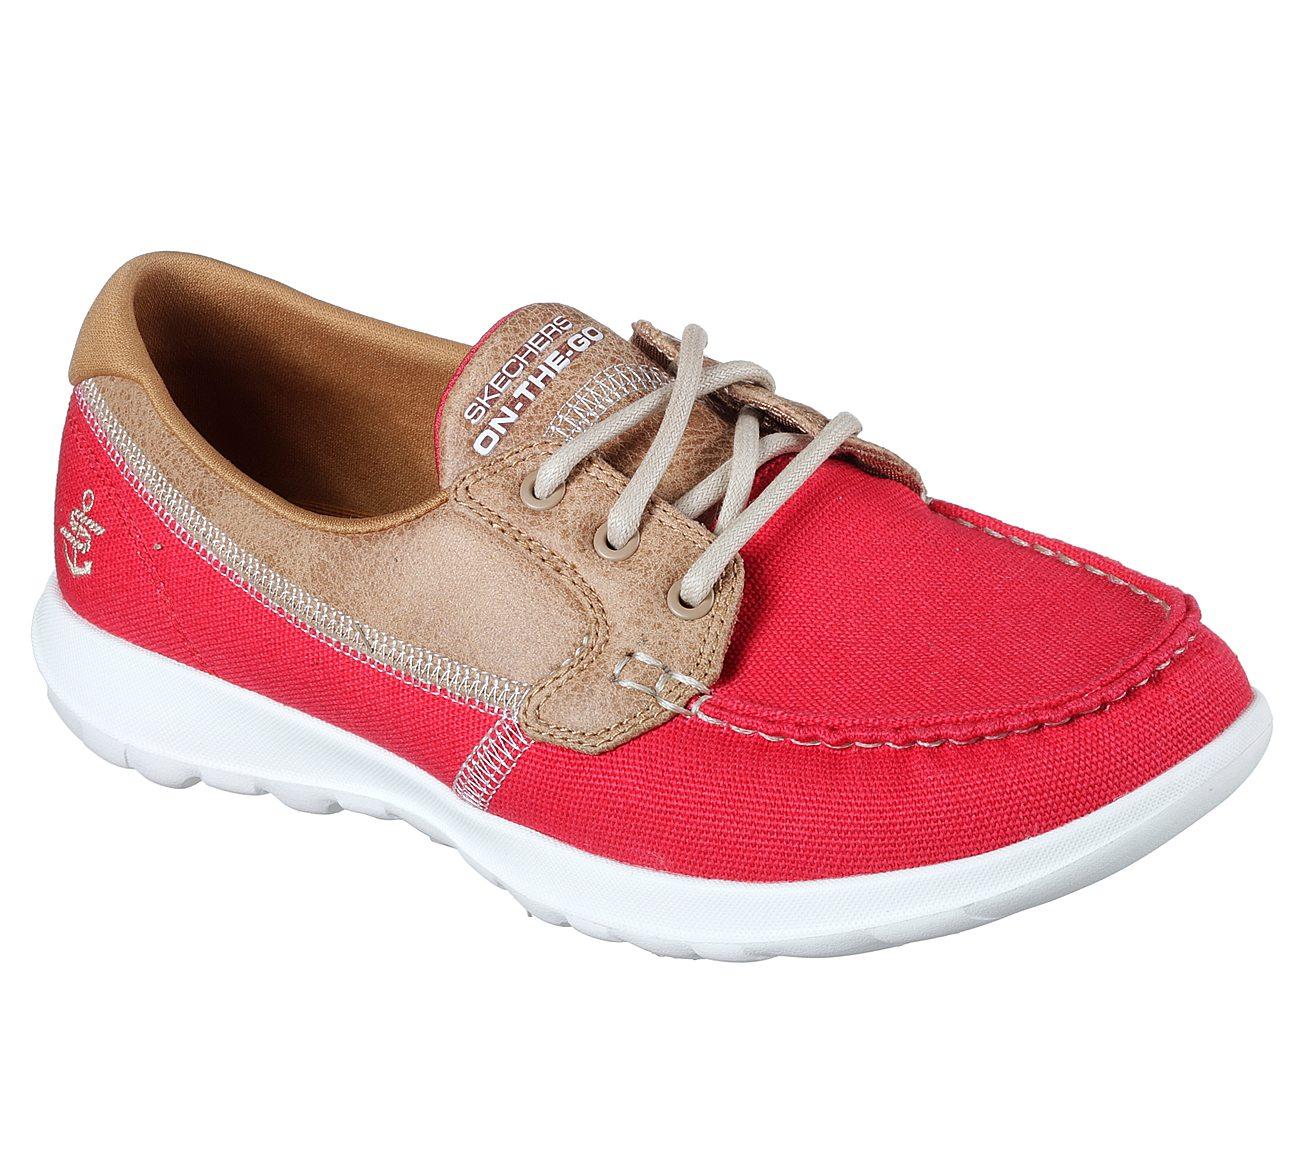 Skechers GOwalk Lite - Coral